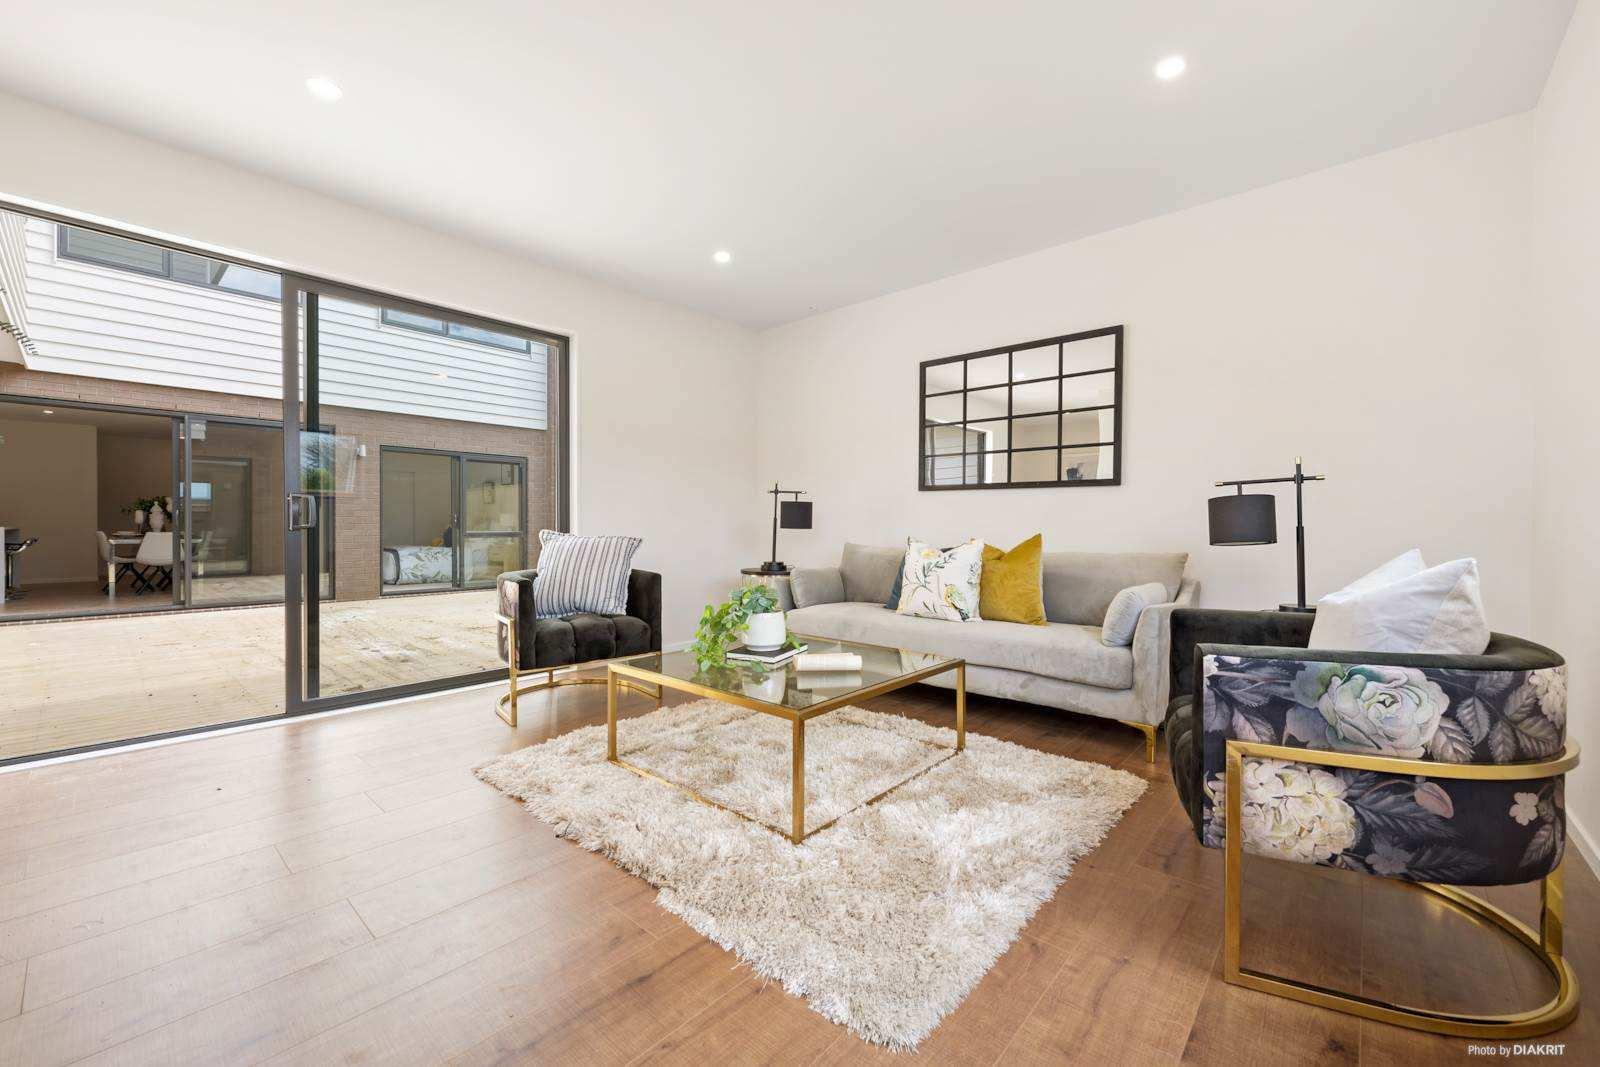 Flat Bush 5房 全新性价比美居 黄金拐角位置 舒阔灵动布局 10年建筑质保 拥抱现代奢华生活! Prime Corner House, Brand-New, Affordable